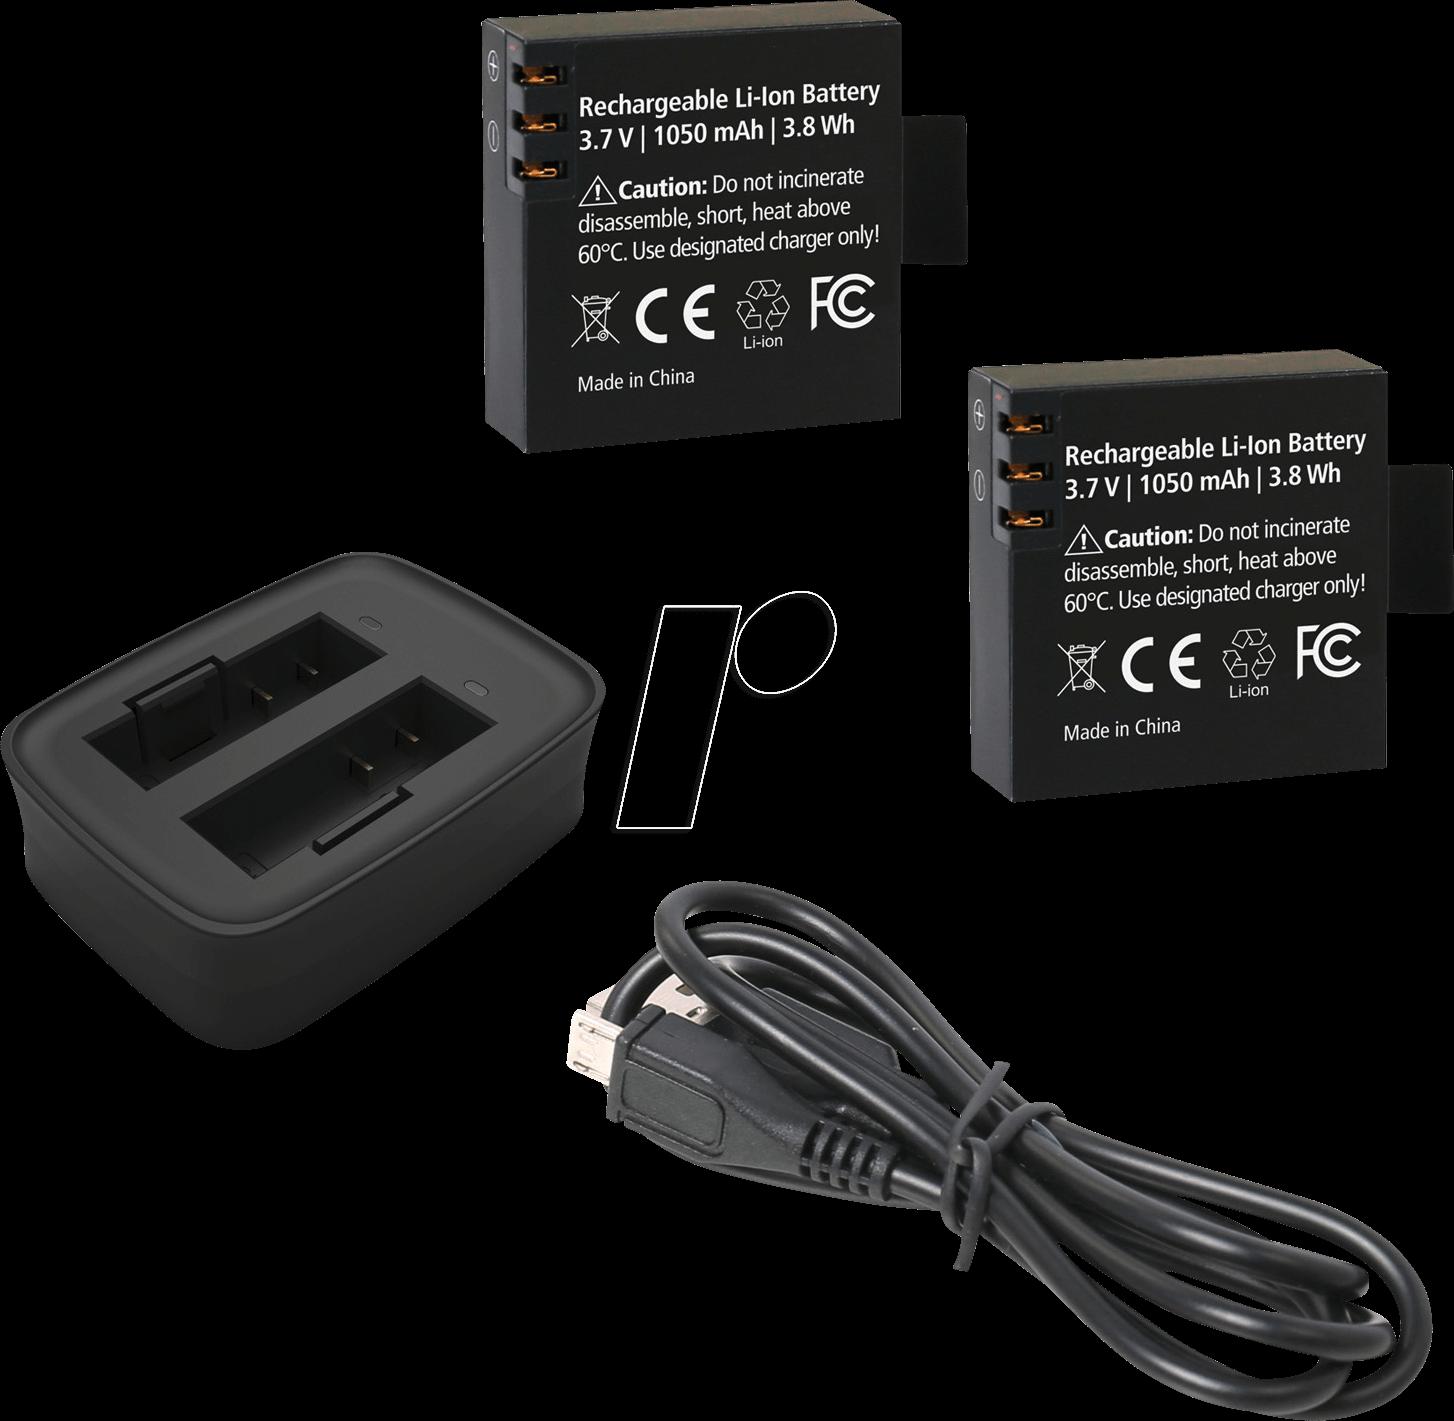 rollei 21645 ladeger t f r actioncam 530 630 inkl 2 akkus bei reichelt elektronik. Black Bedroom Furniture Sets. Home Design Ideas